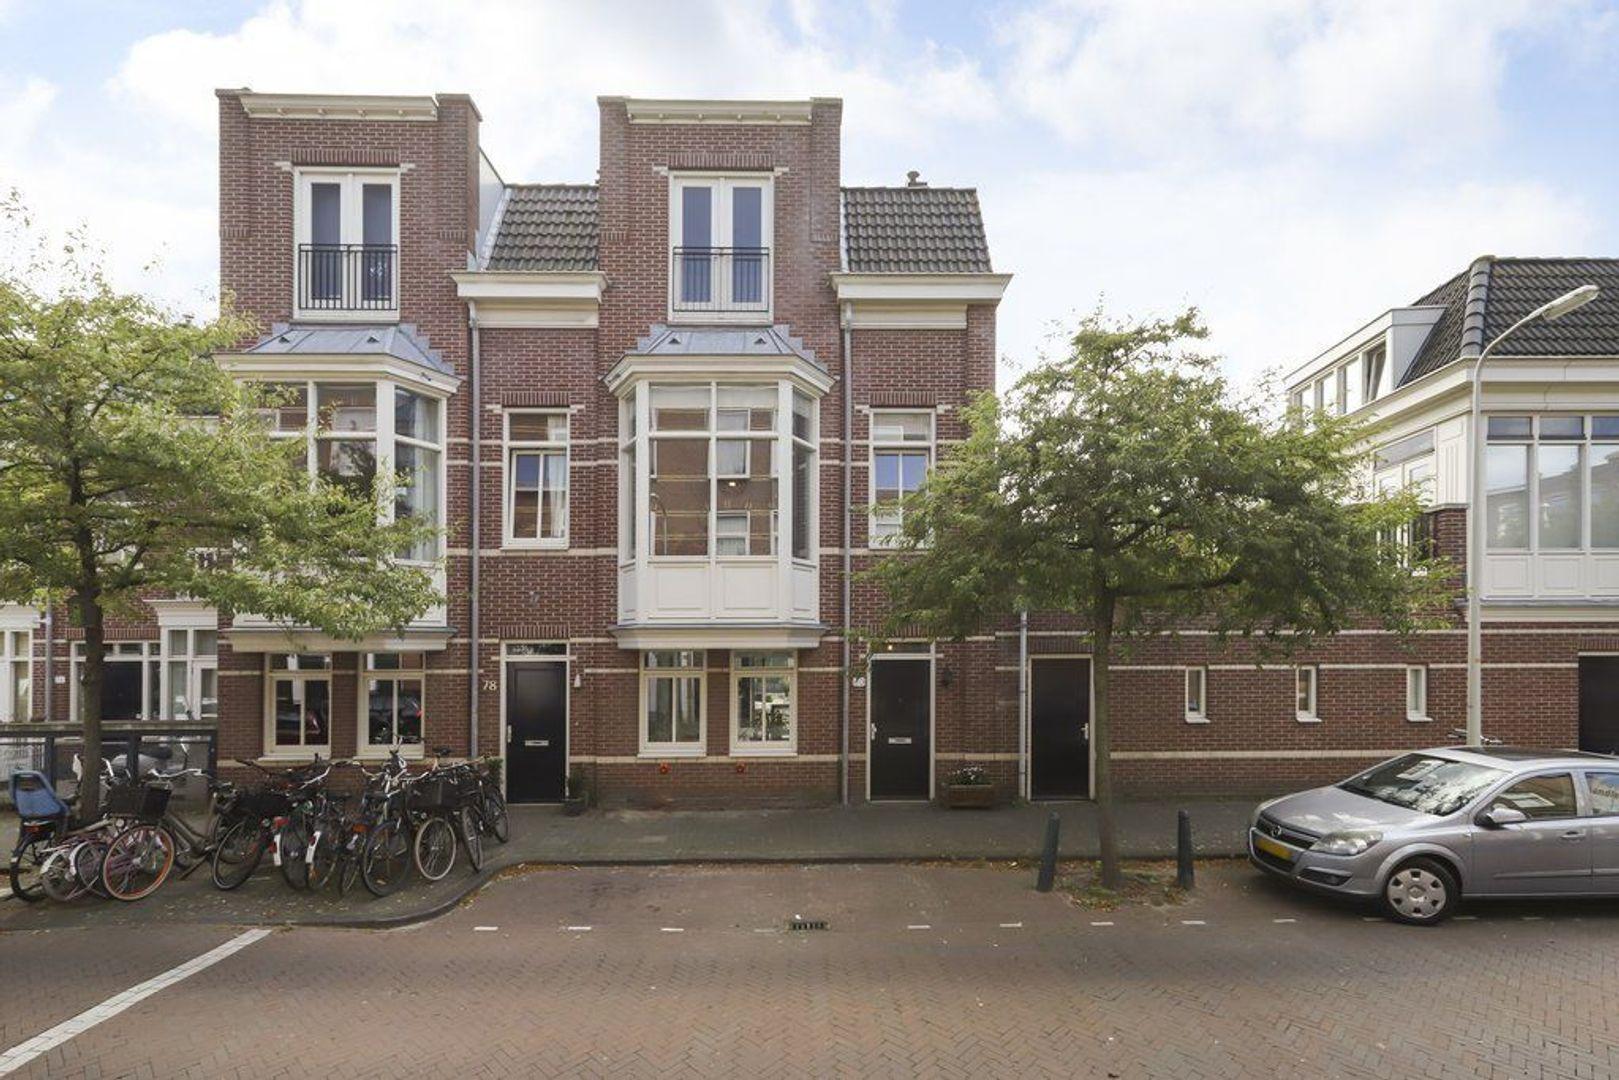 Vinkensteynstraat 80, Den Haag foto-1 blur